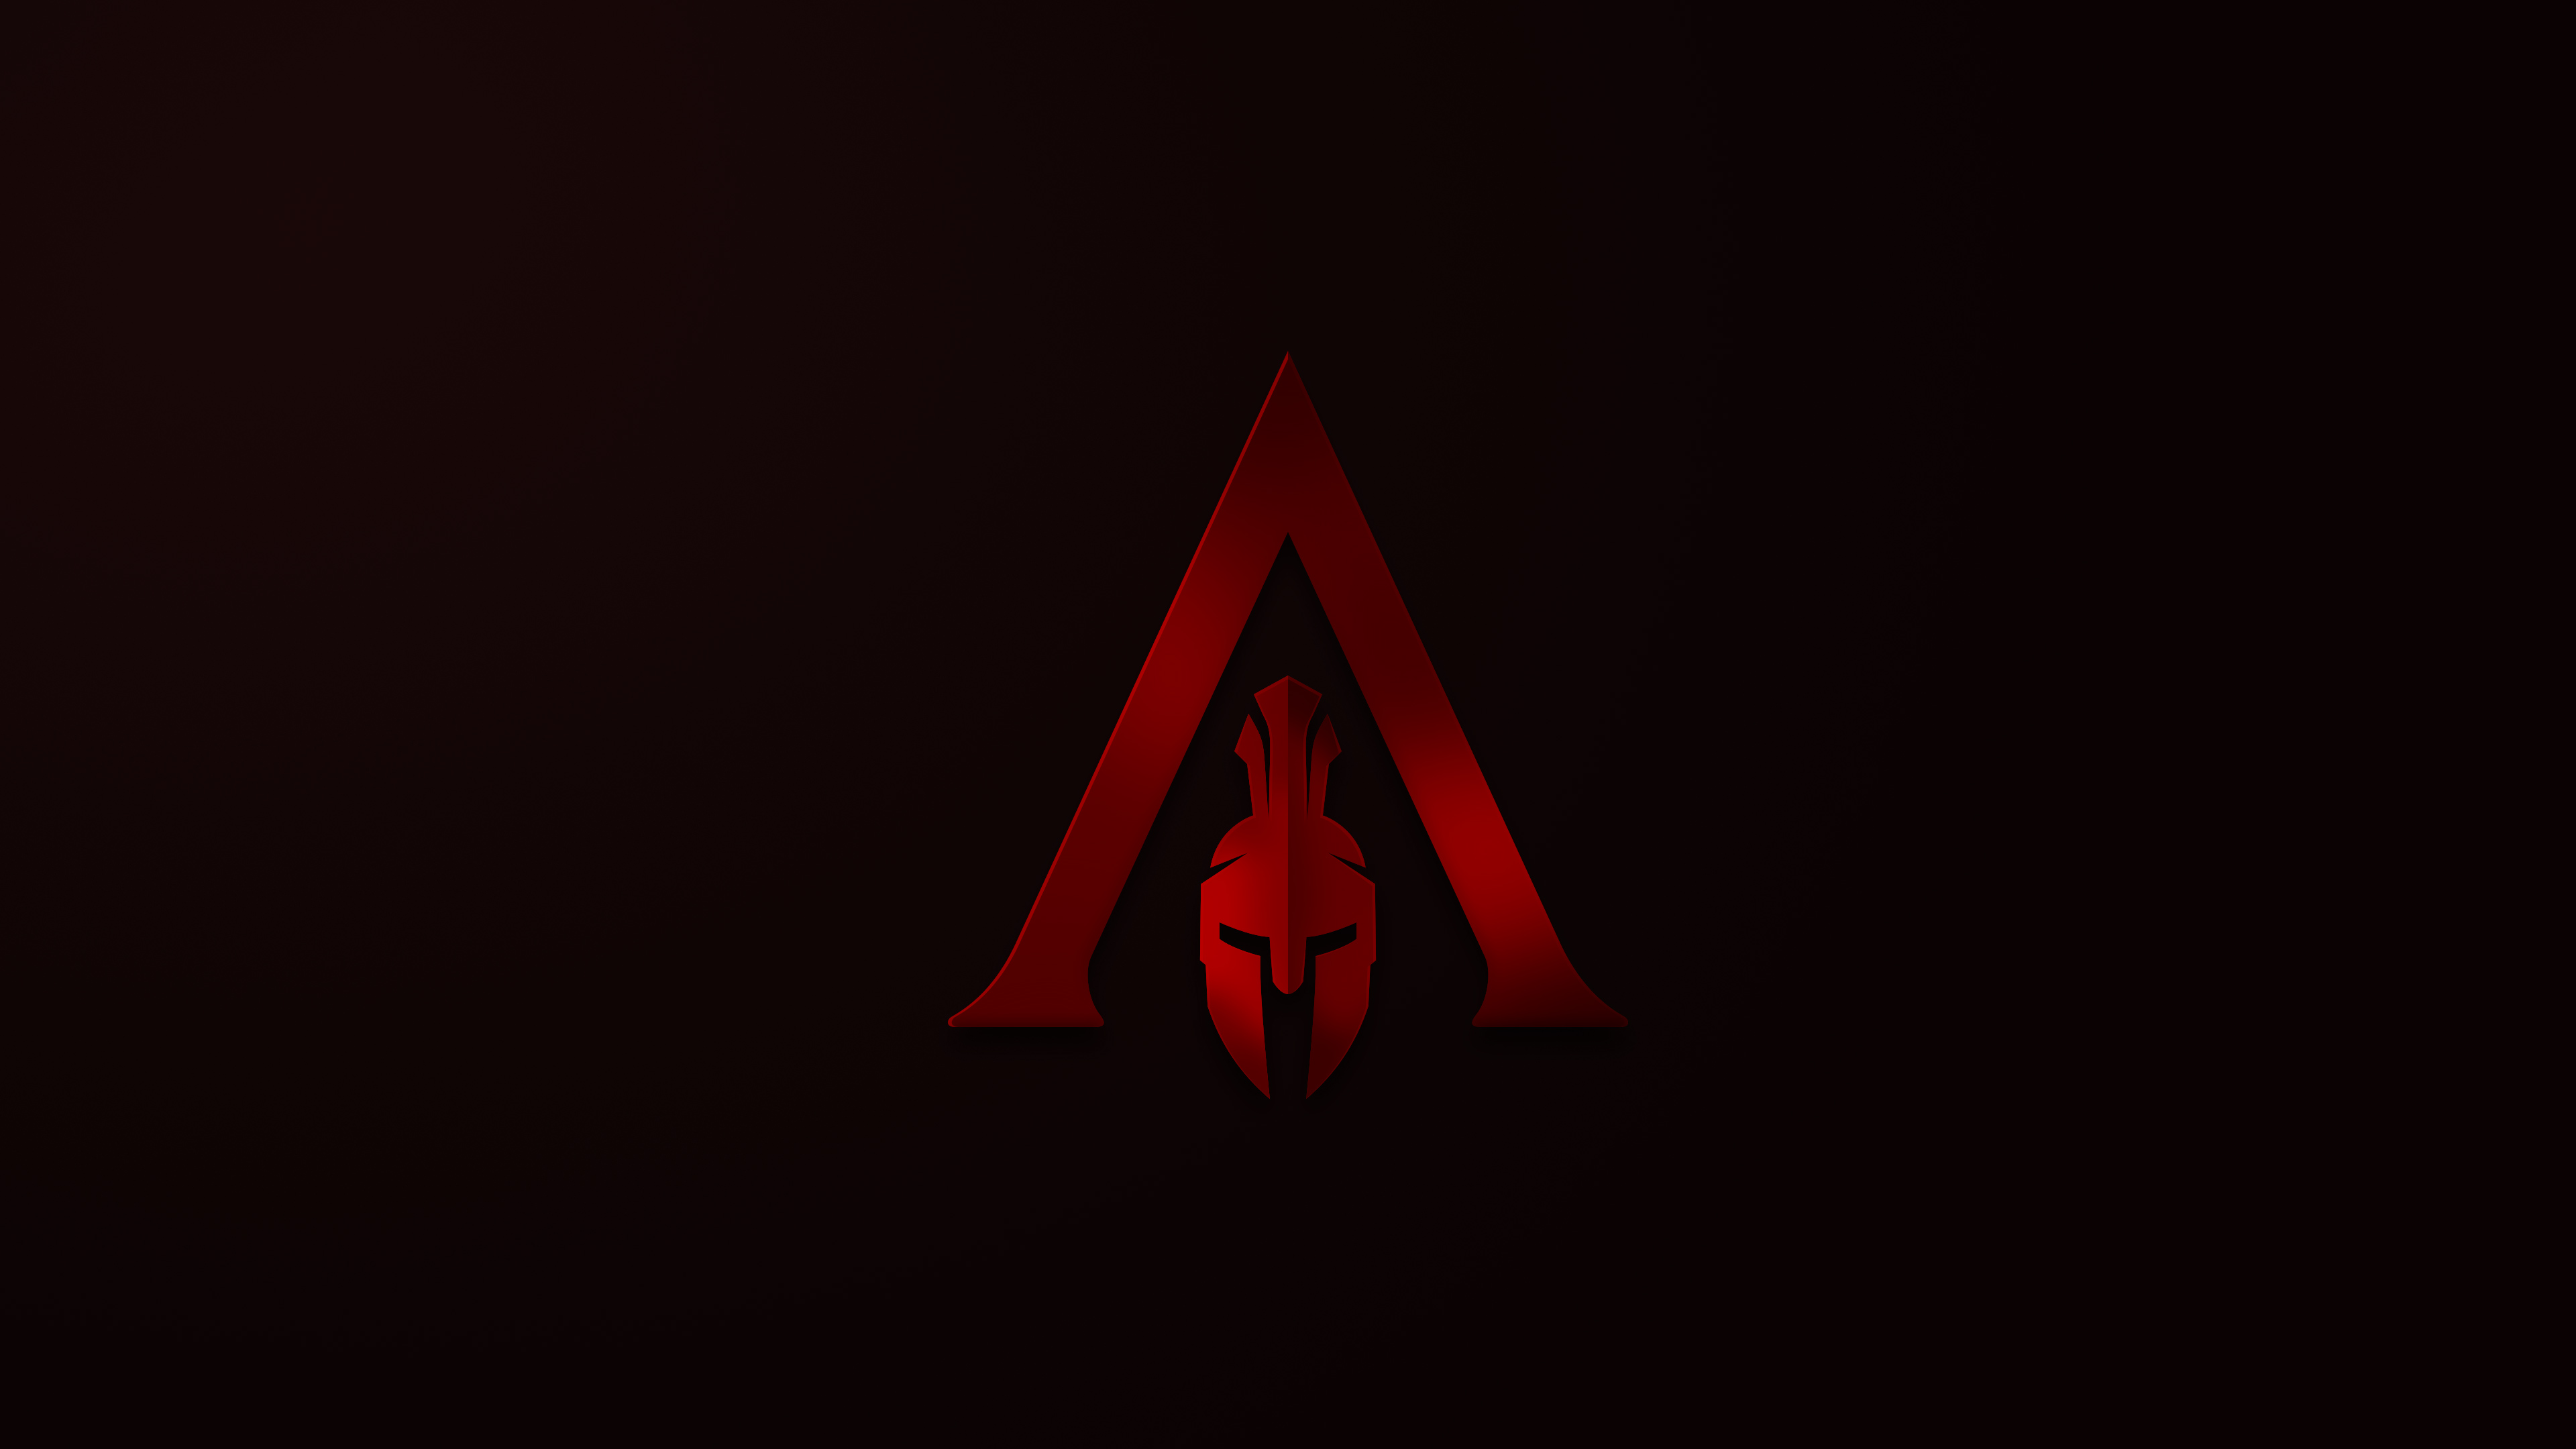 Assassins Creed Odyssey Minimalism Logo 4k, HD Games, 4k.